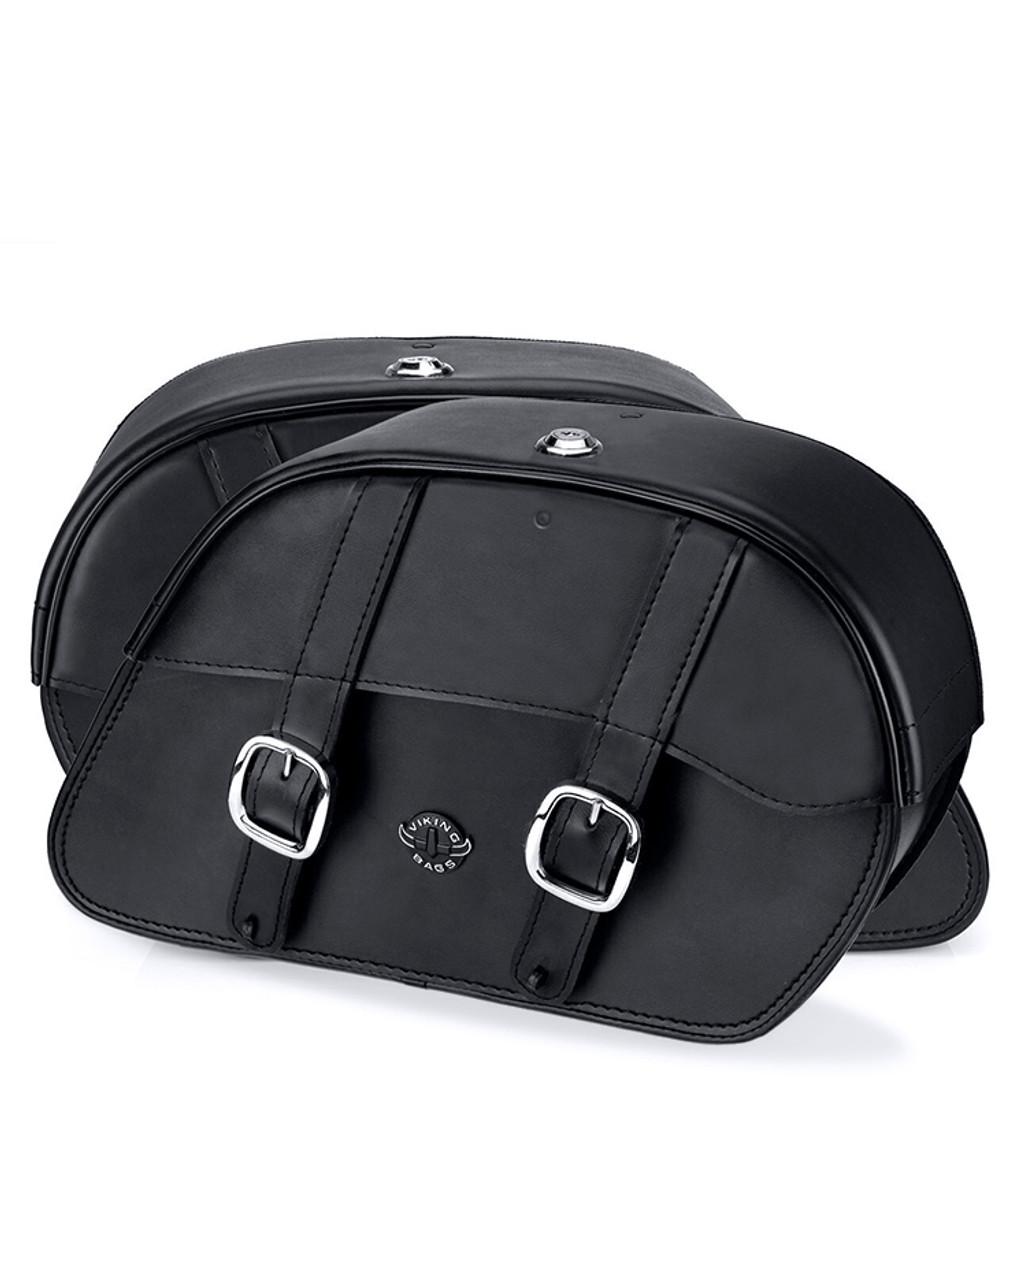 VikingBags Skarner Large Double Strap Honda 1100 Shadow Aero Leather Motorcycle Saddlebags Both Bags View